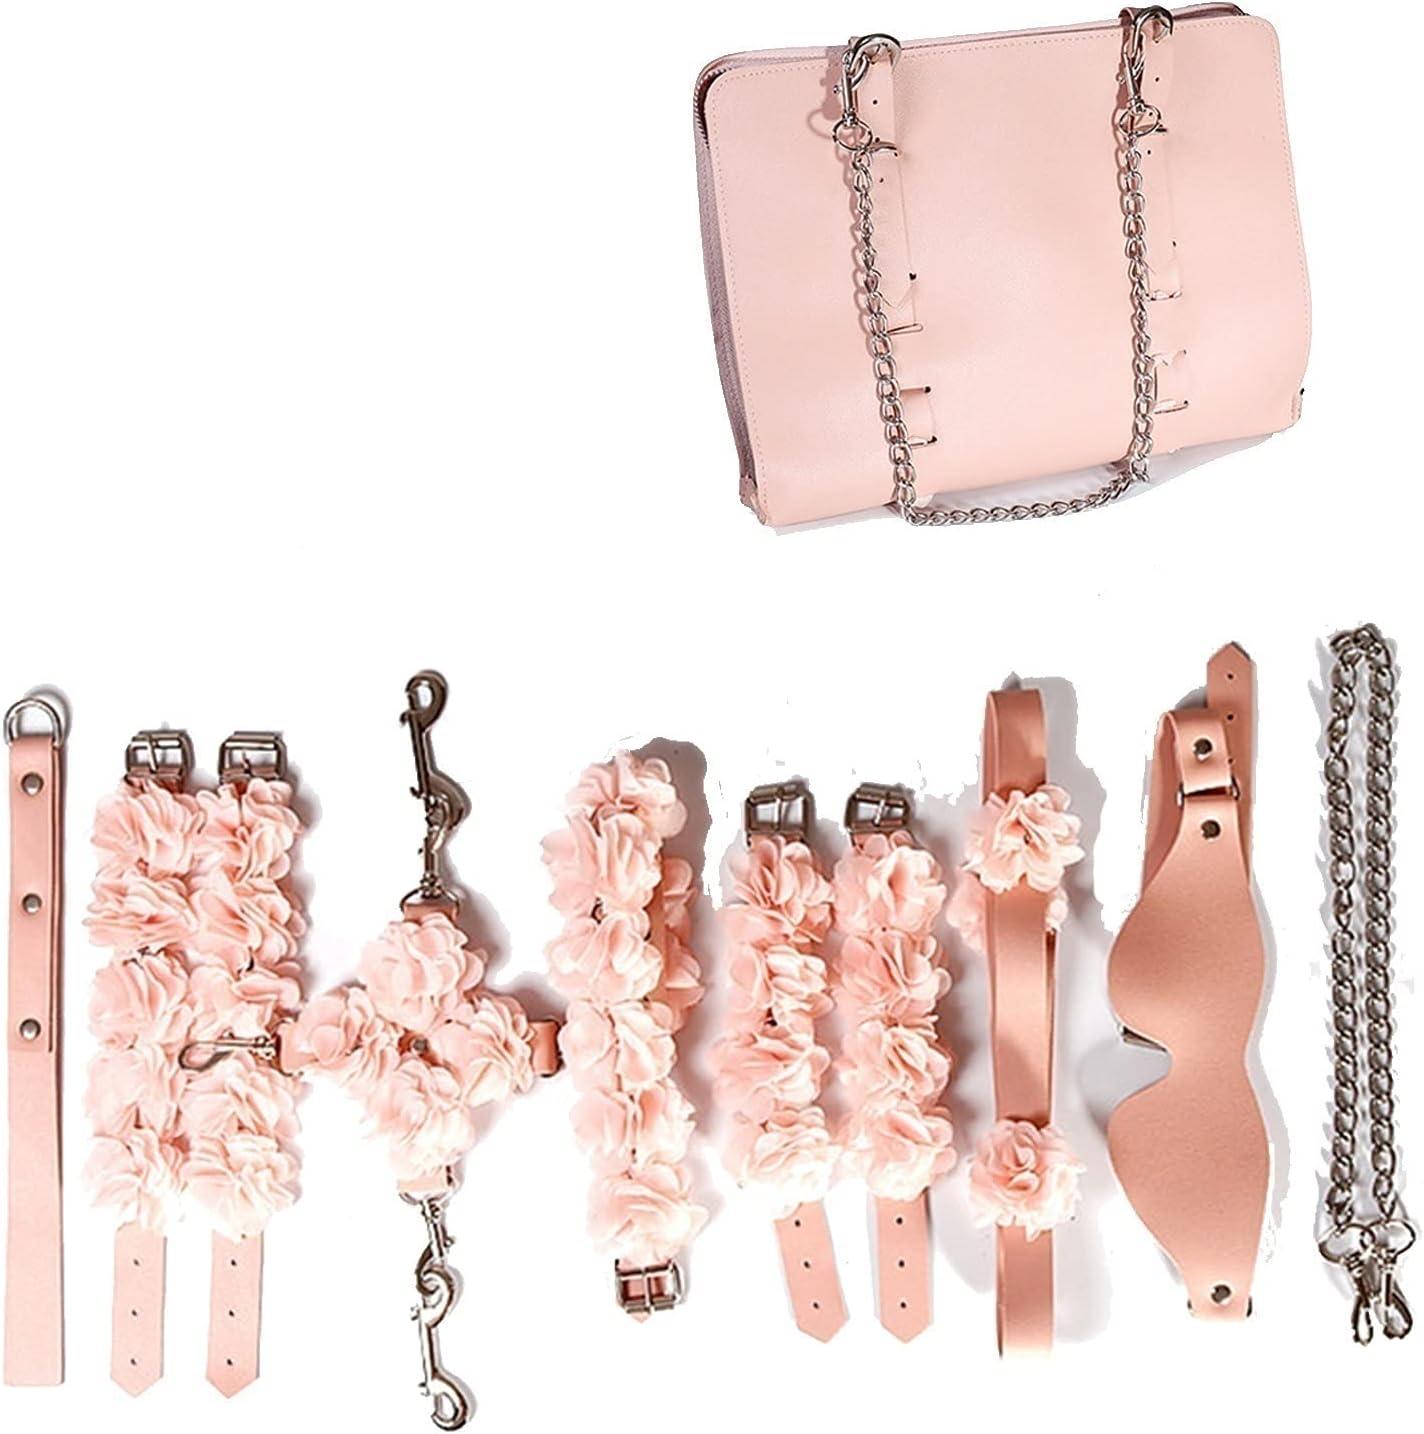 MBVBN Flower Lace Leather GạṛṭẹáLeg Ranking TOP7 Nylon shopping